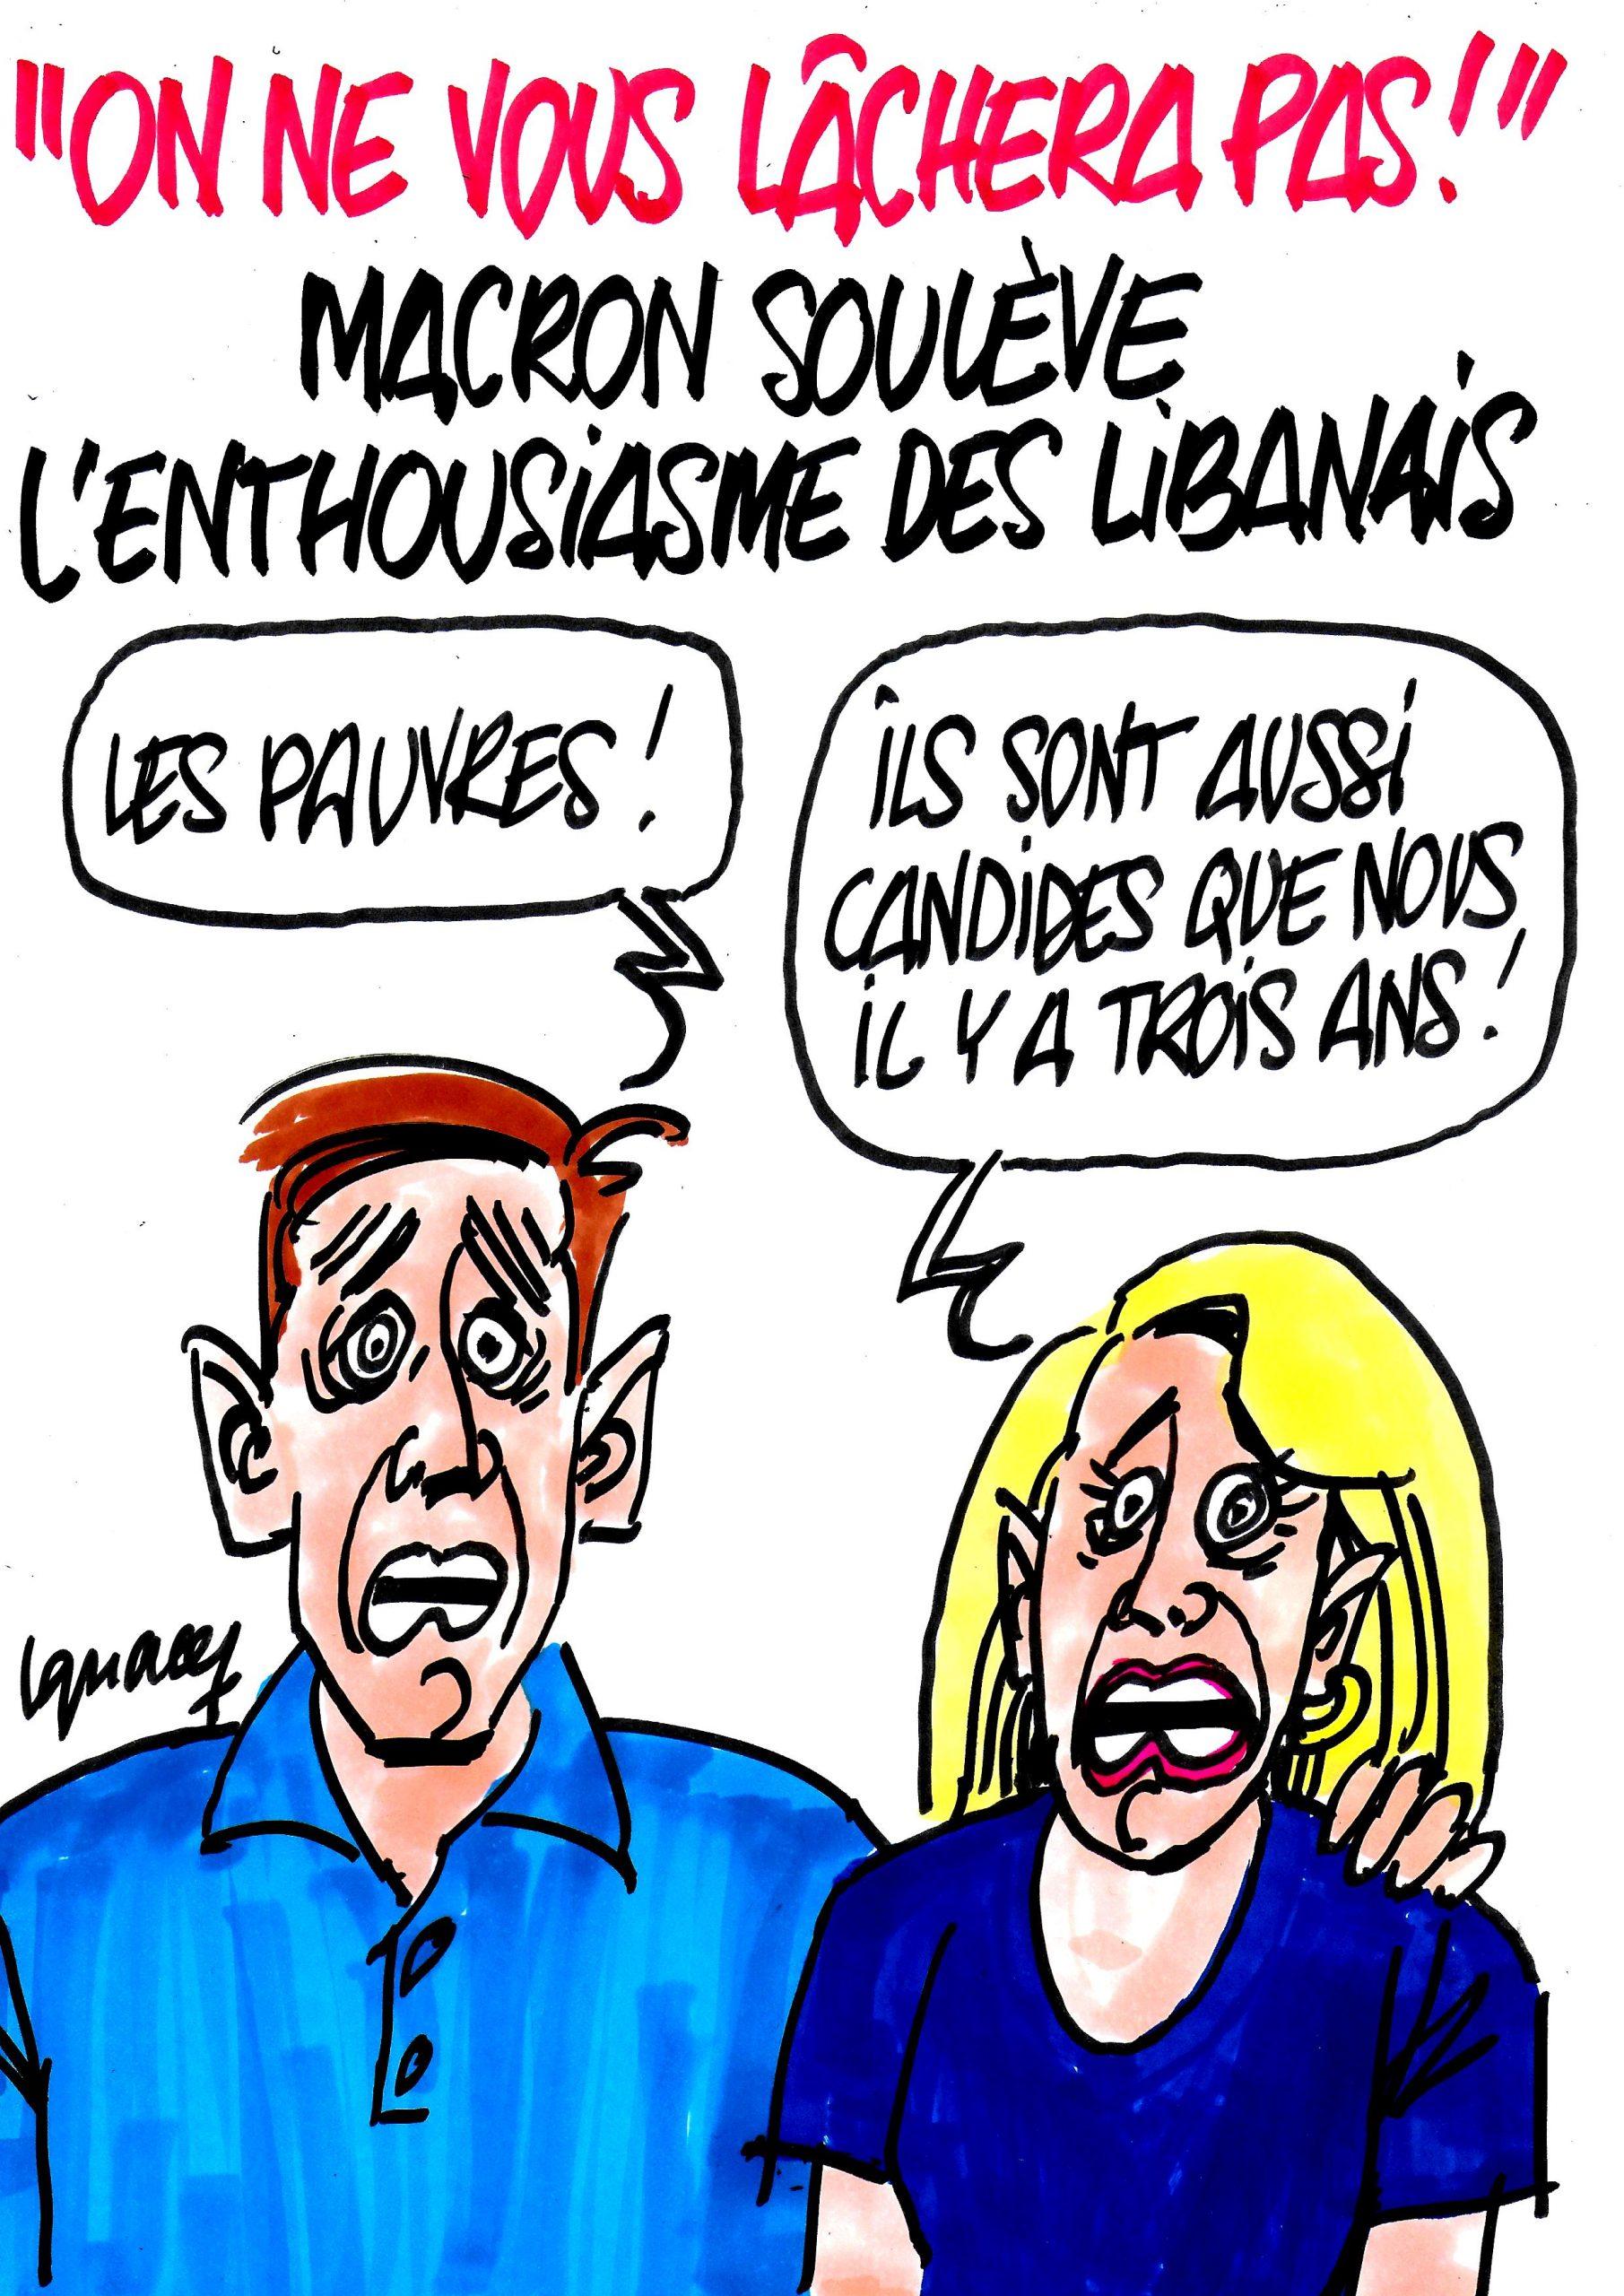 Ignace - Macron soulève l'enthousiasme des Libanais